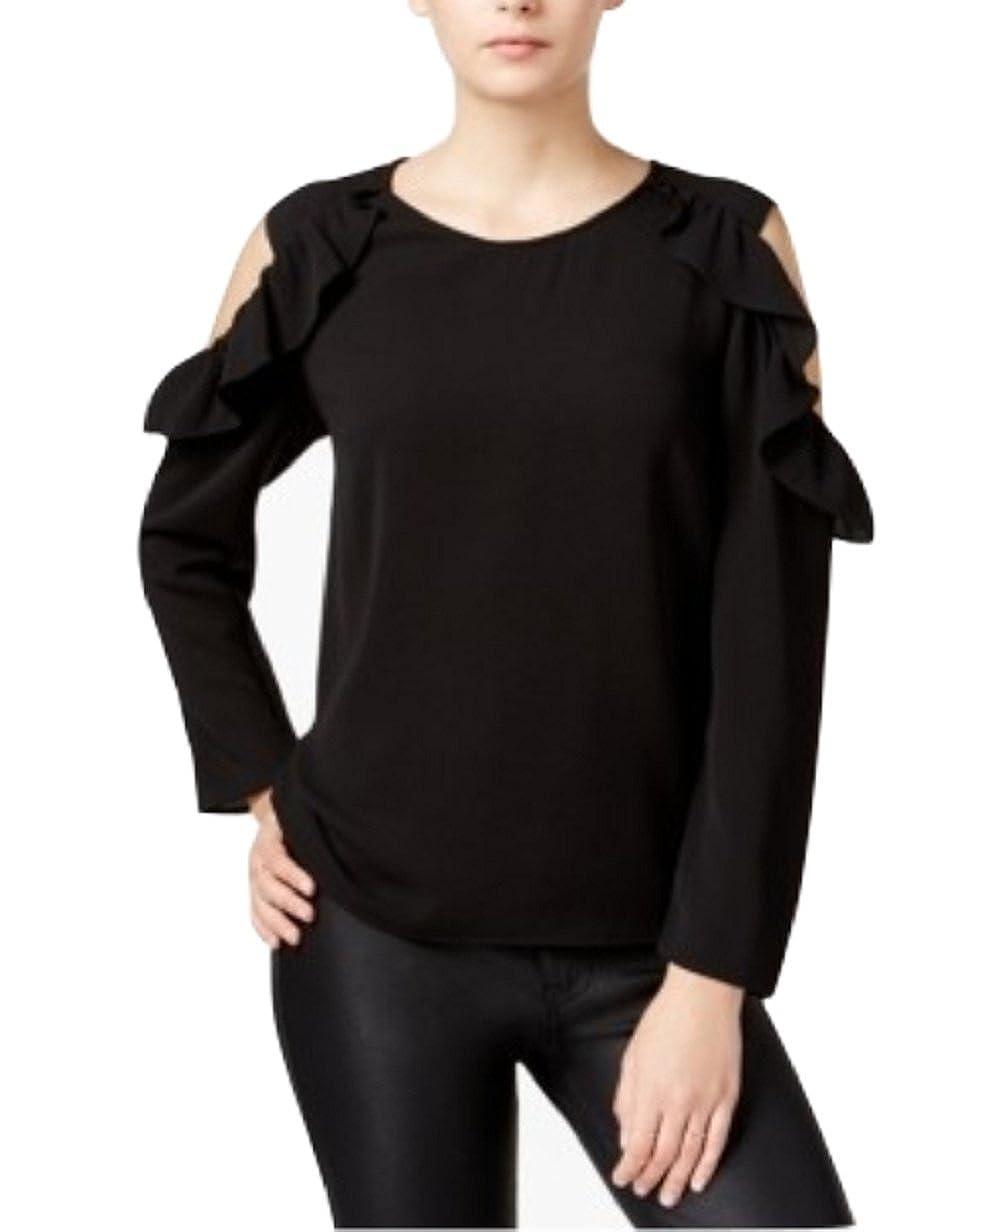 Bar III Ruffled Cold Shoulder Top Fashionable Dress Womens Black Large